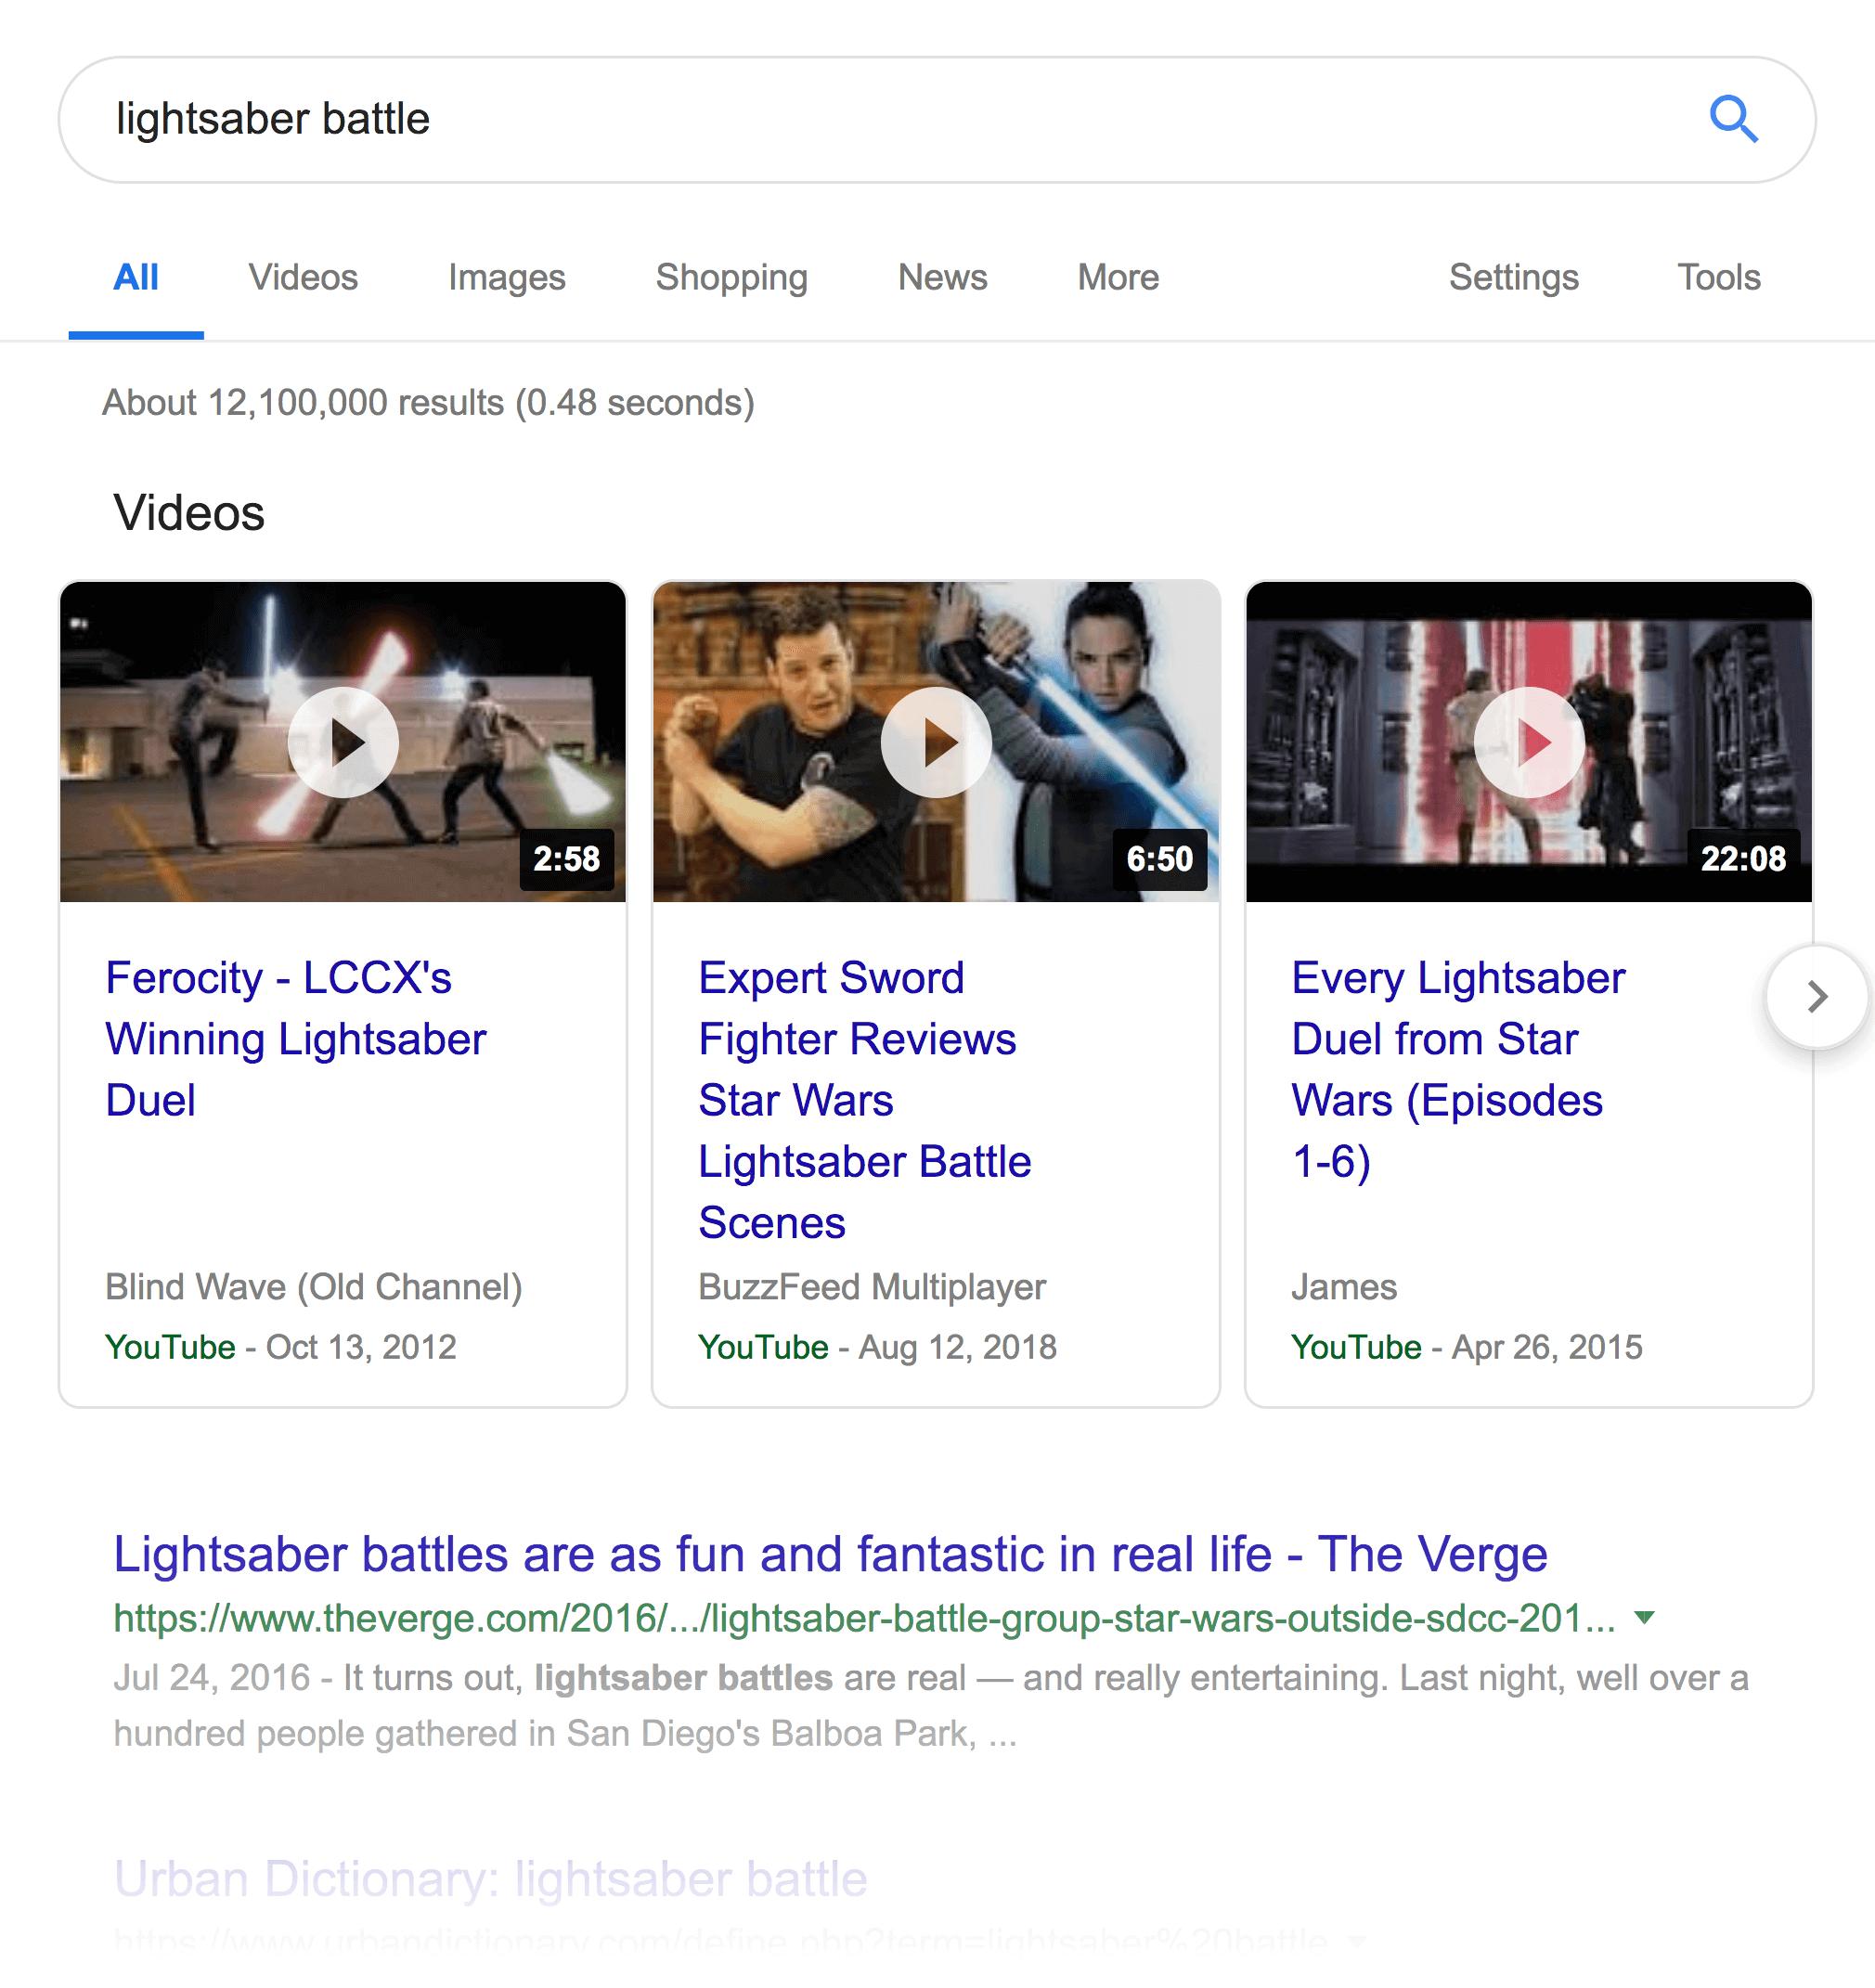 Finding video keywords